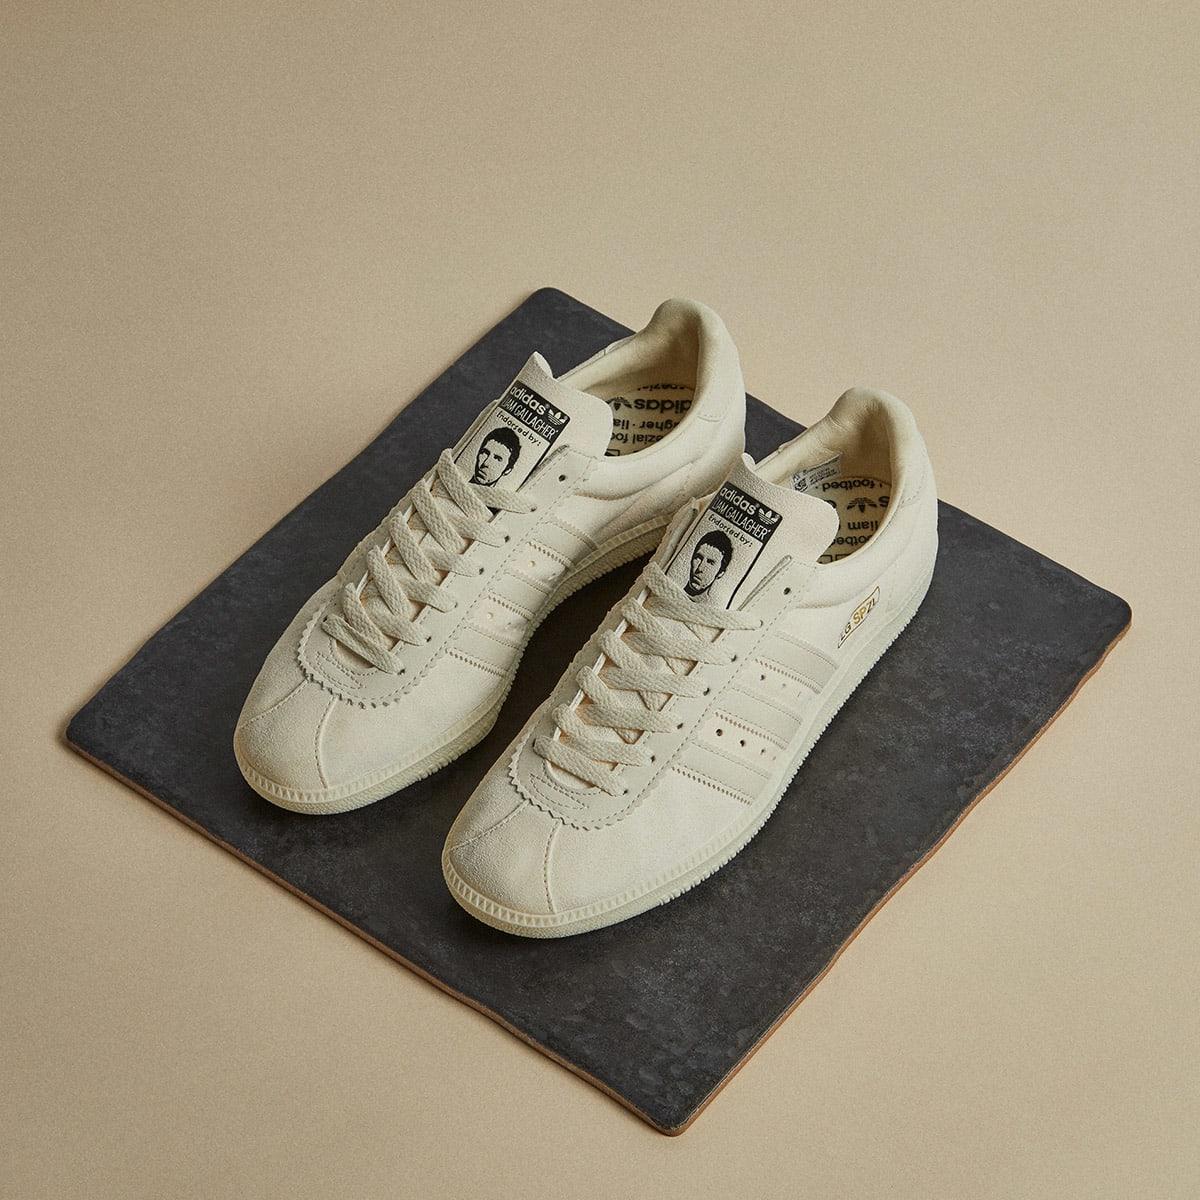 Adidas x Liam Gallagher Padiham SPZL